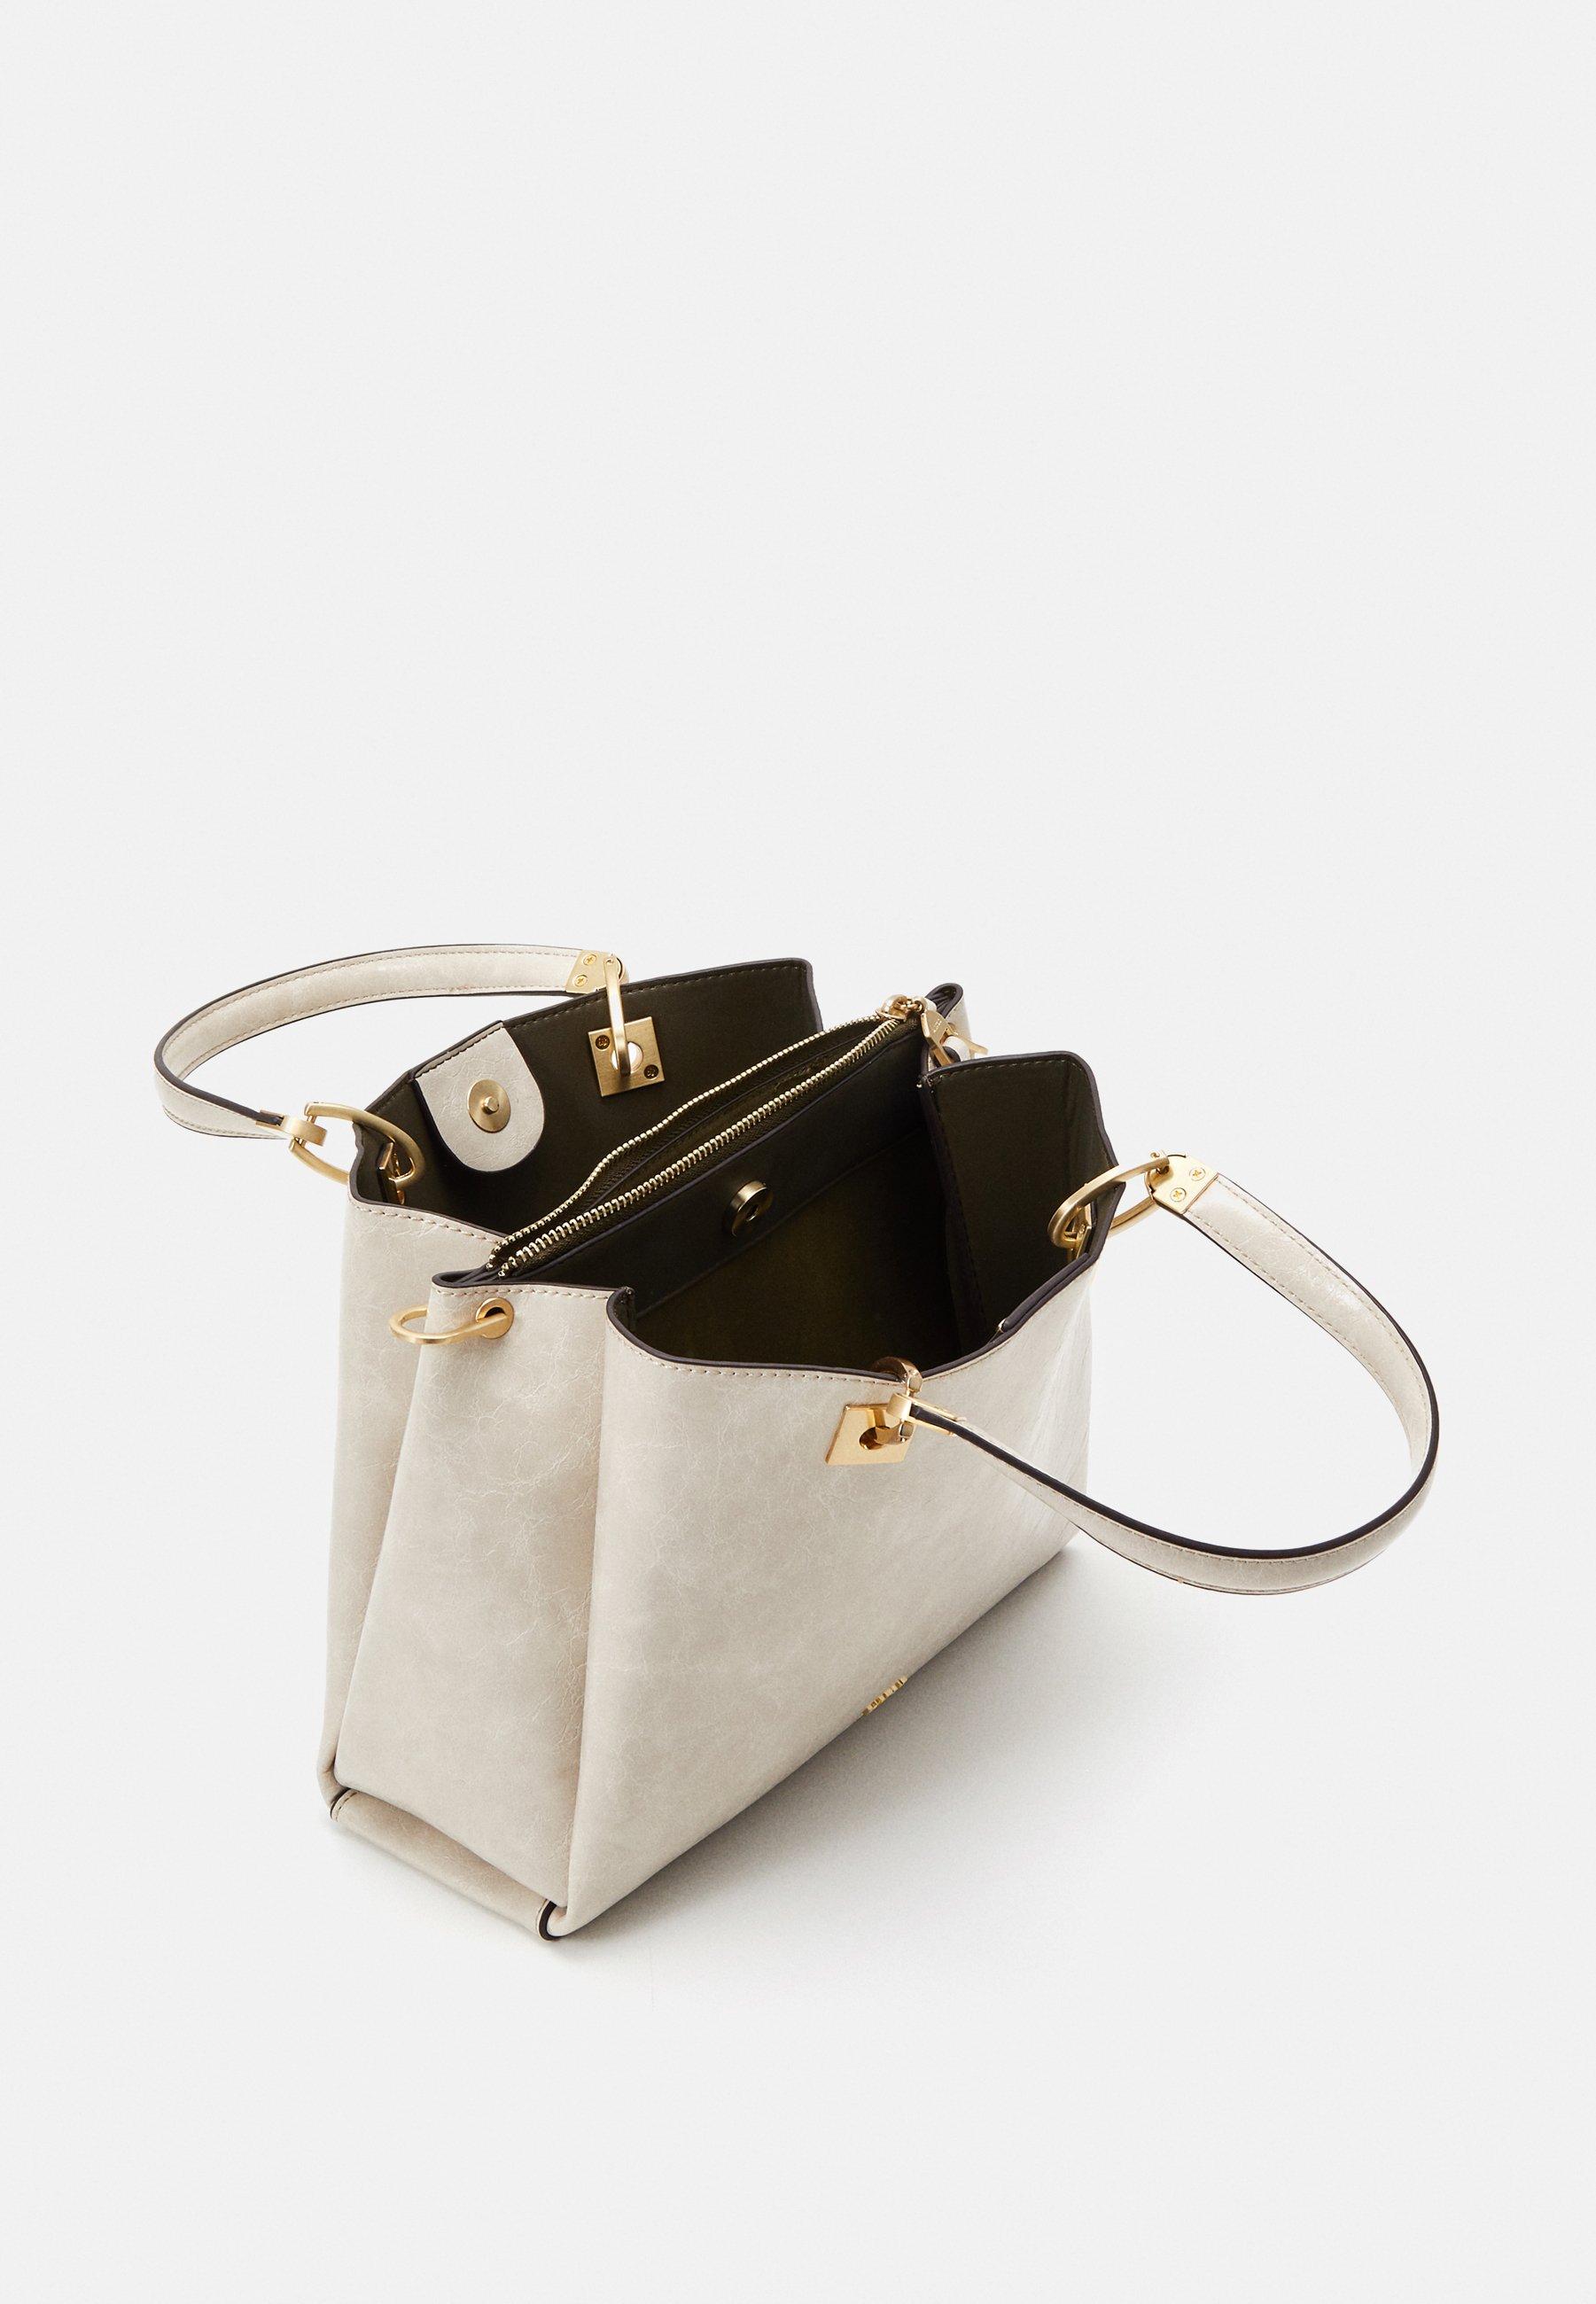 Parfois Shopper Bag Mimosa - Handtasche Ecru/offwhite